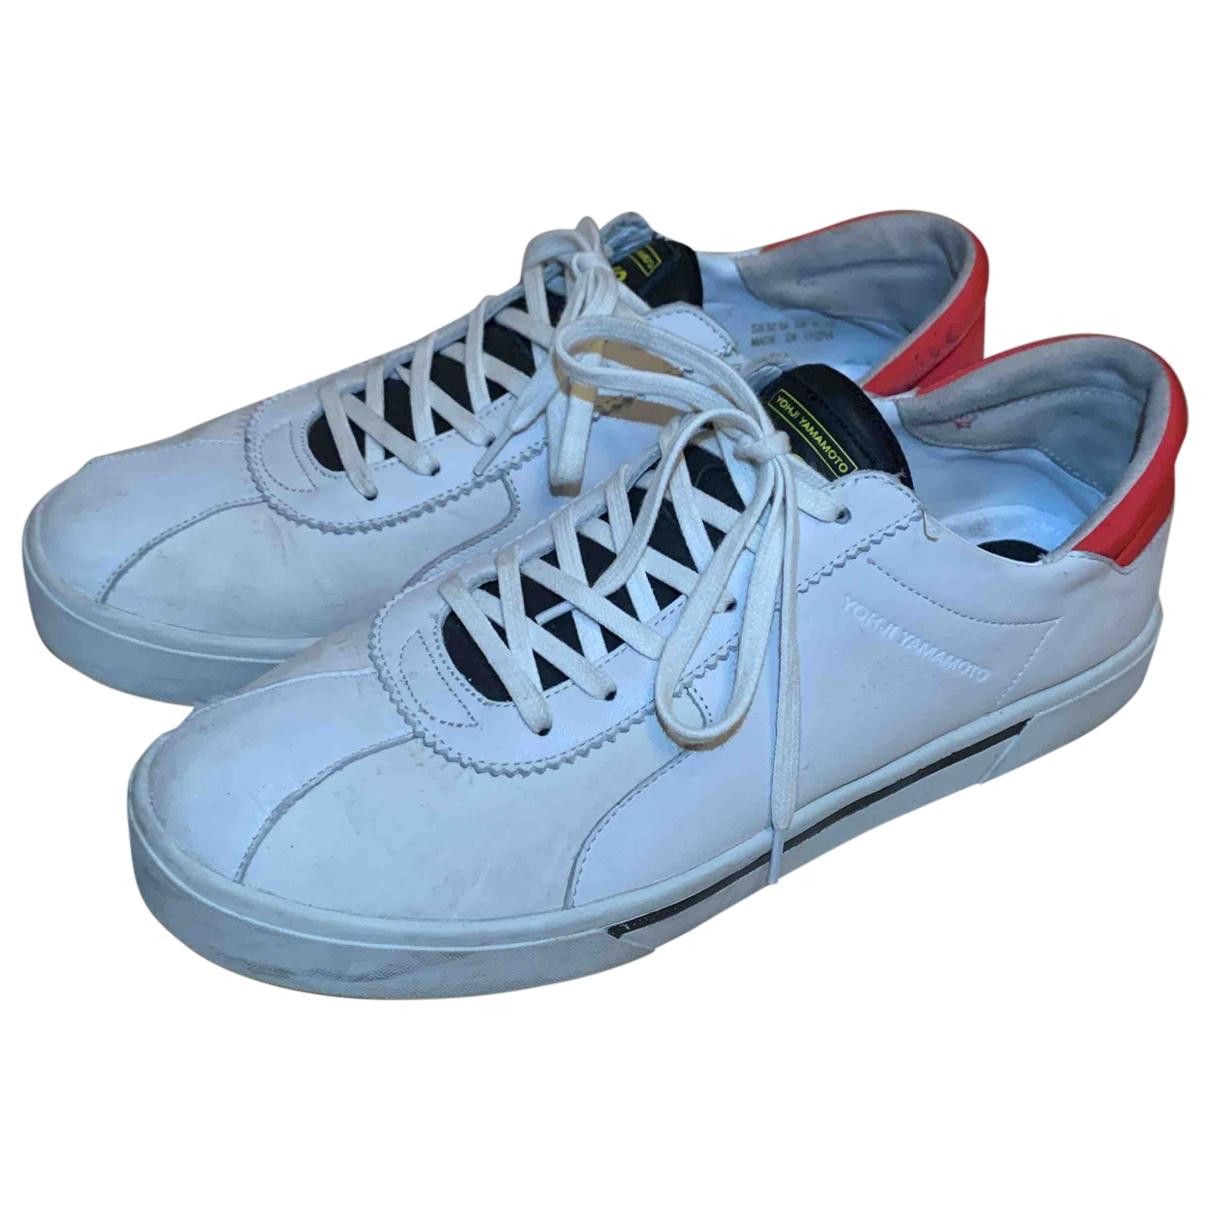 Y-3 By Yohji Yamamoto \N Sneakers in  Weiss Leder